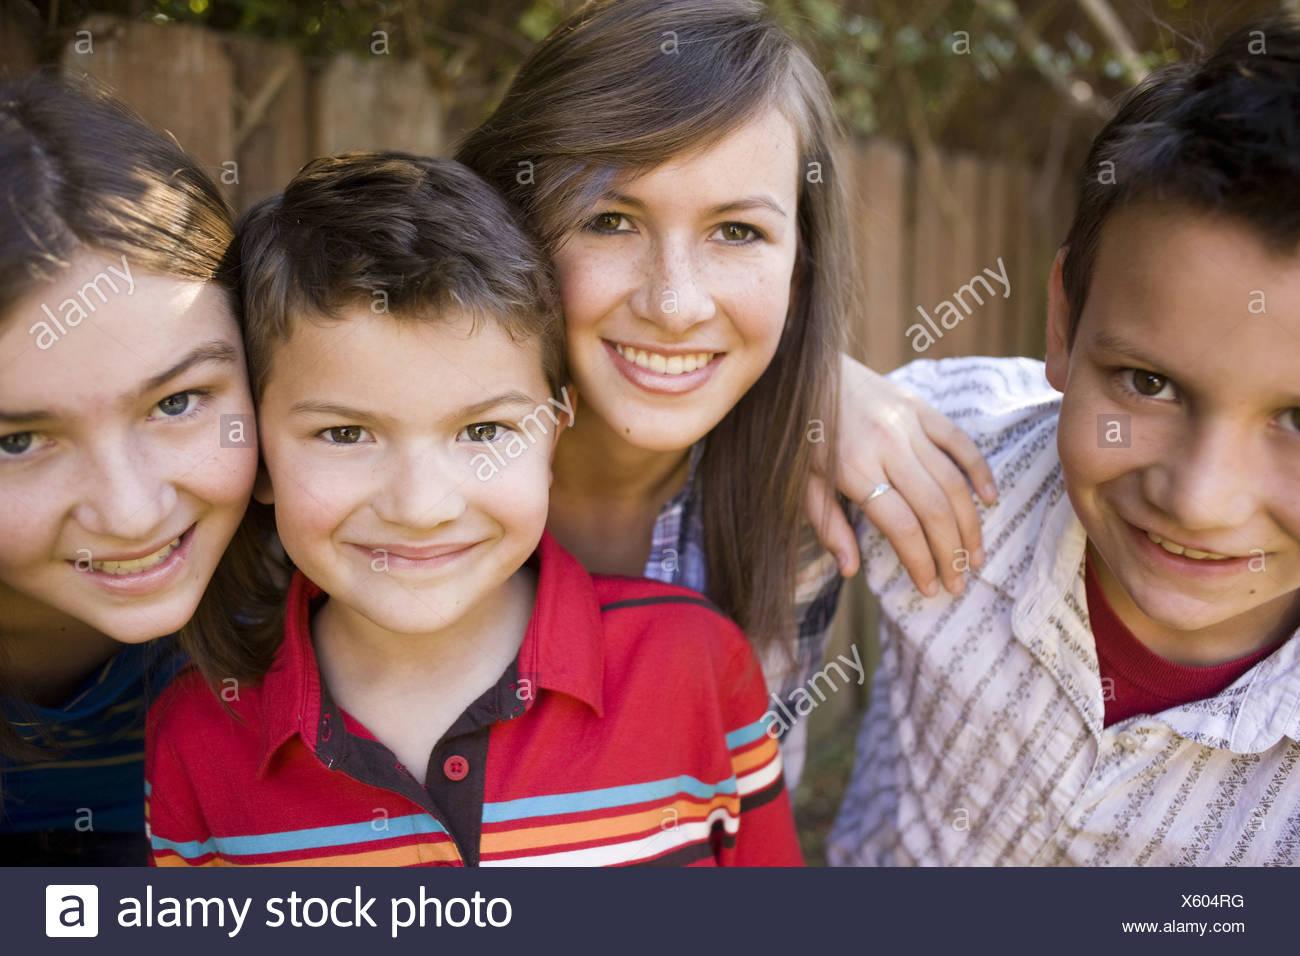 Smiling children posing outdoors - Stock Image